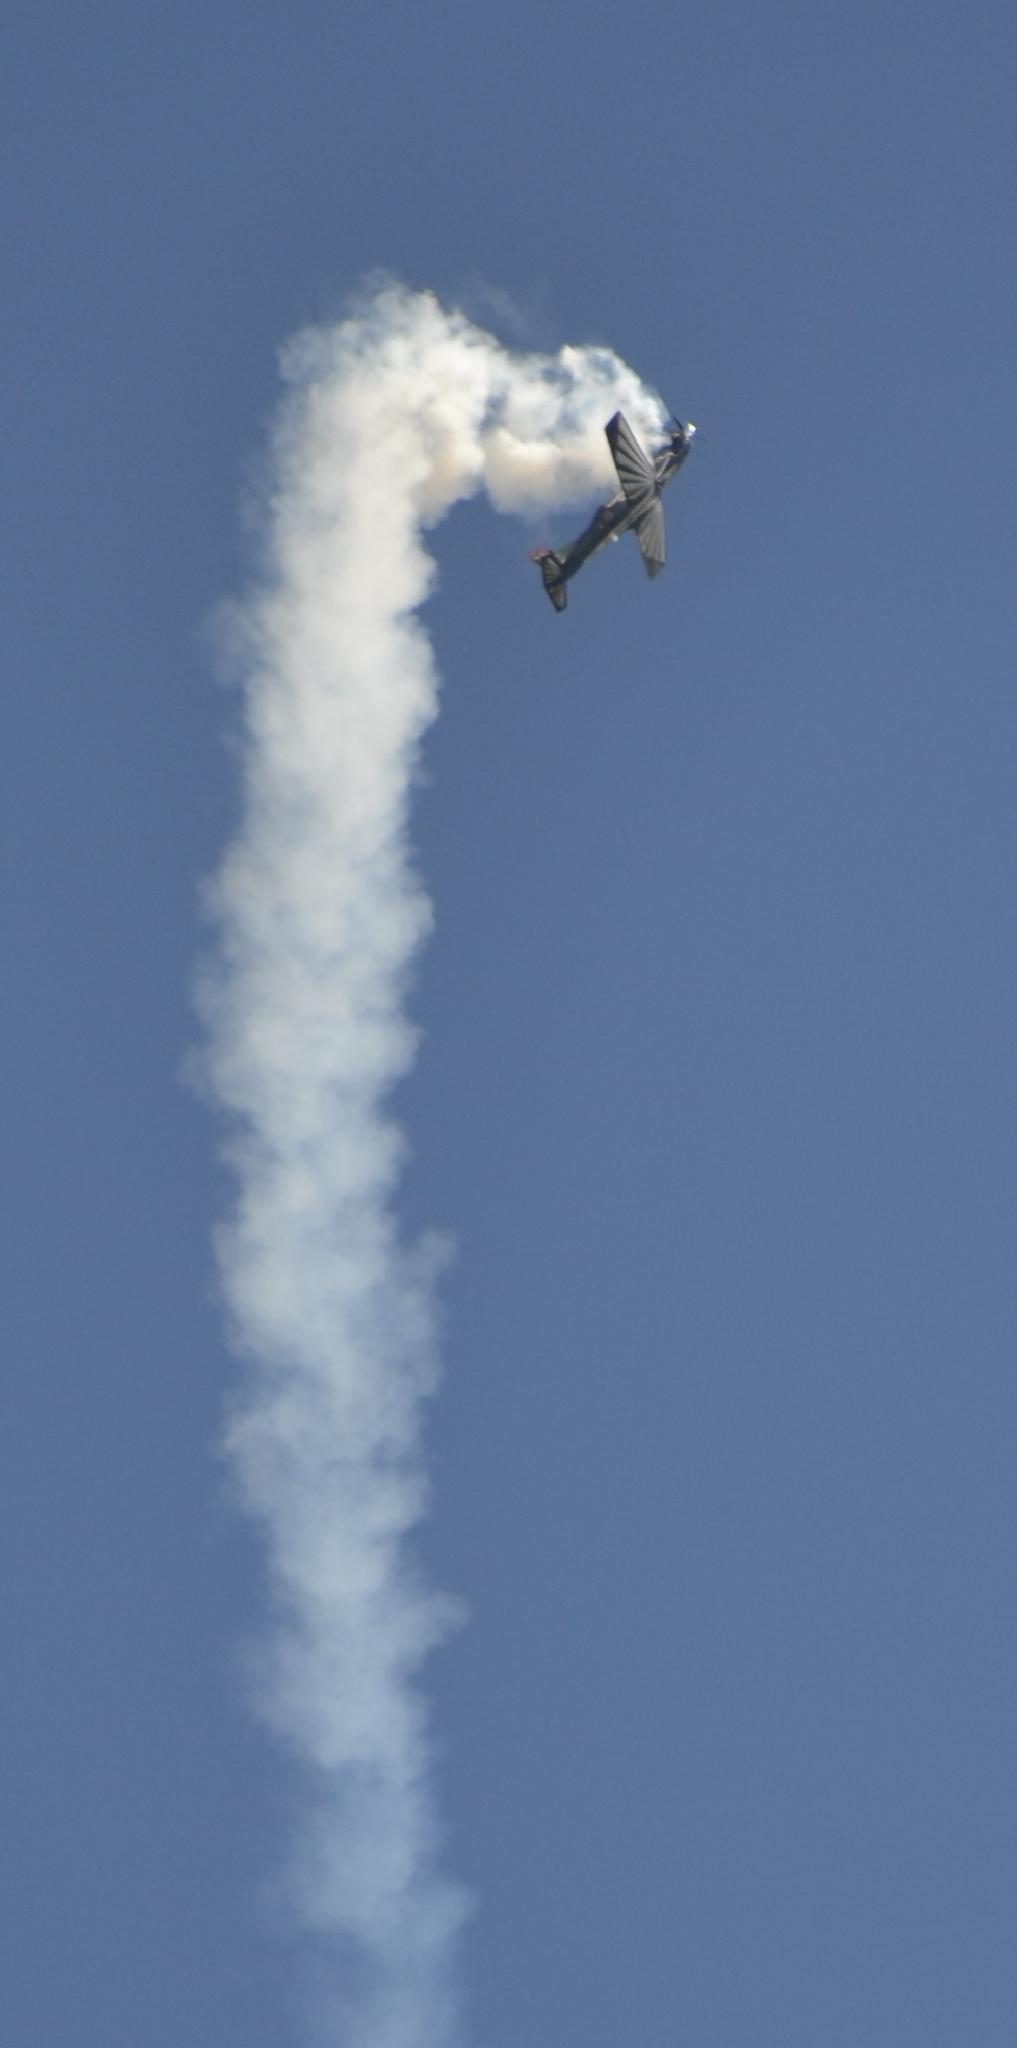 Aerobatics by Louis Blom Photography